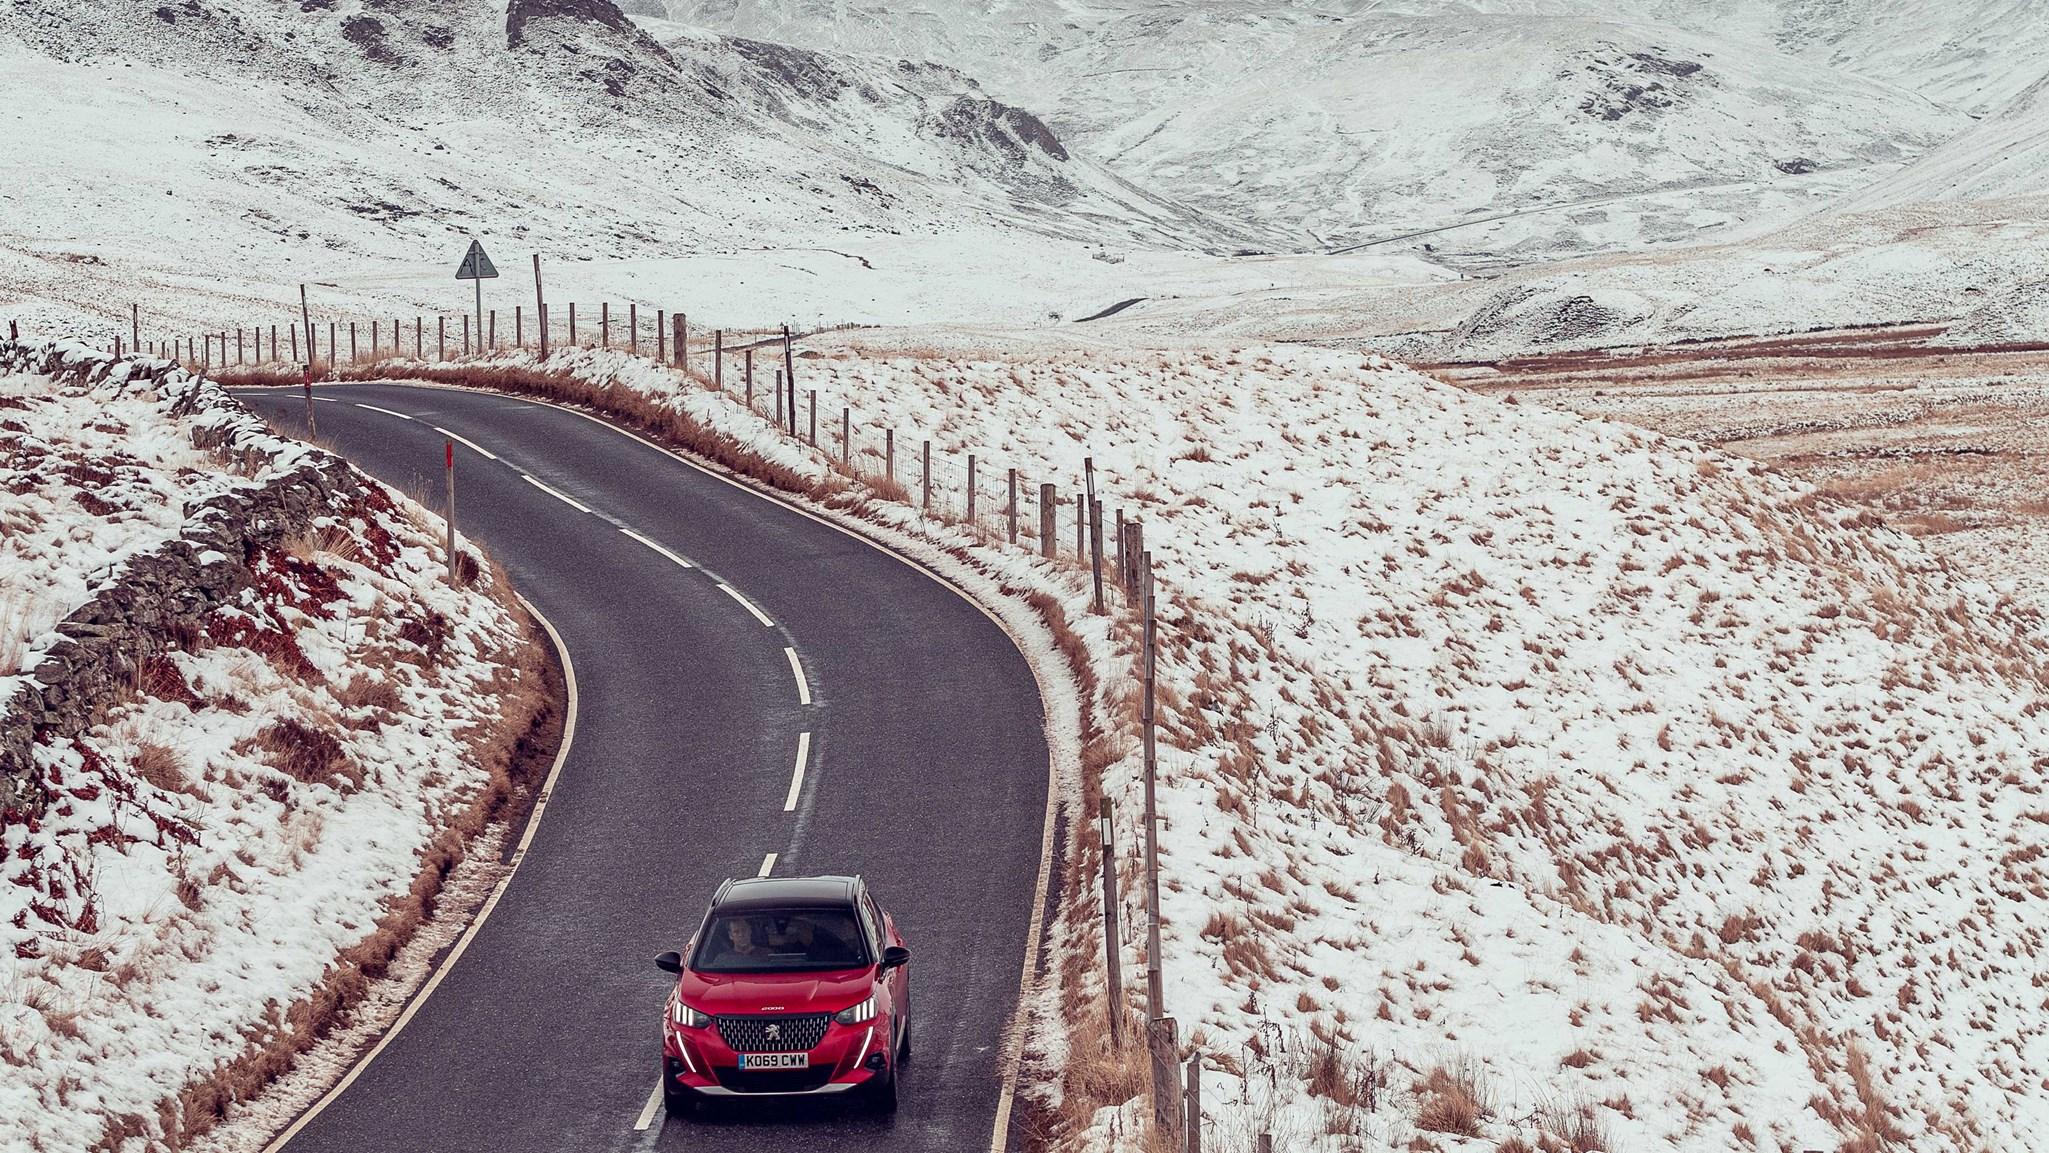 Peugeot 2008 battles Scotland's winter en route to John O'Groats